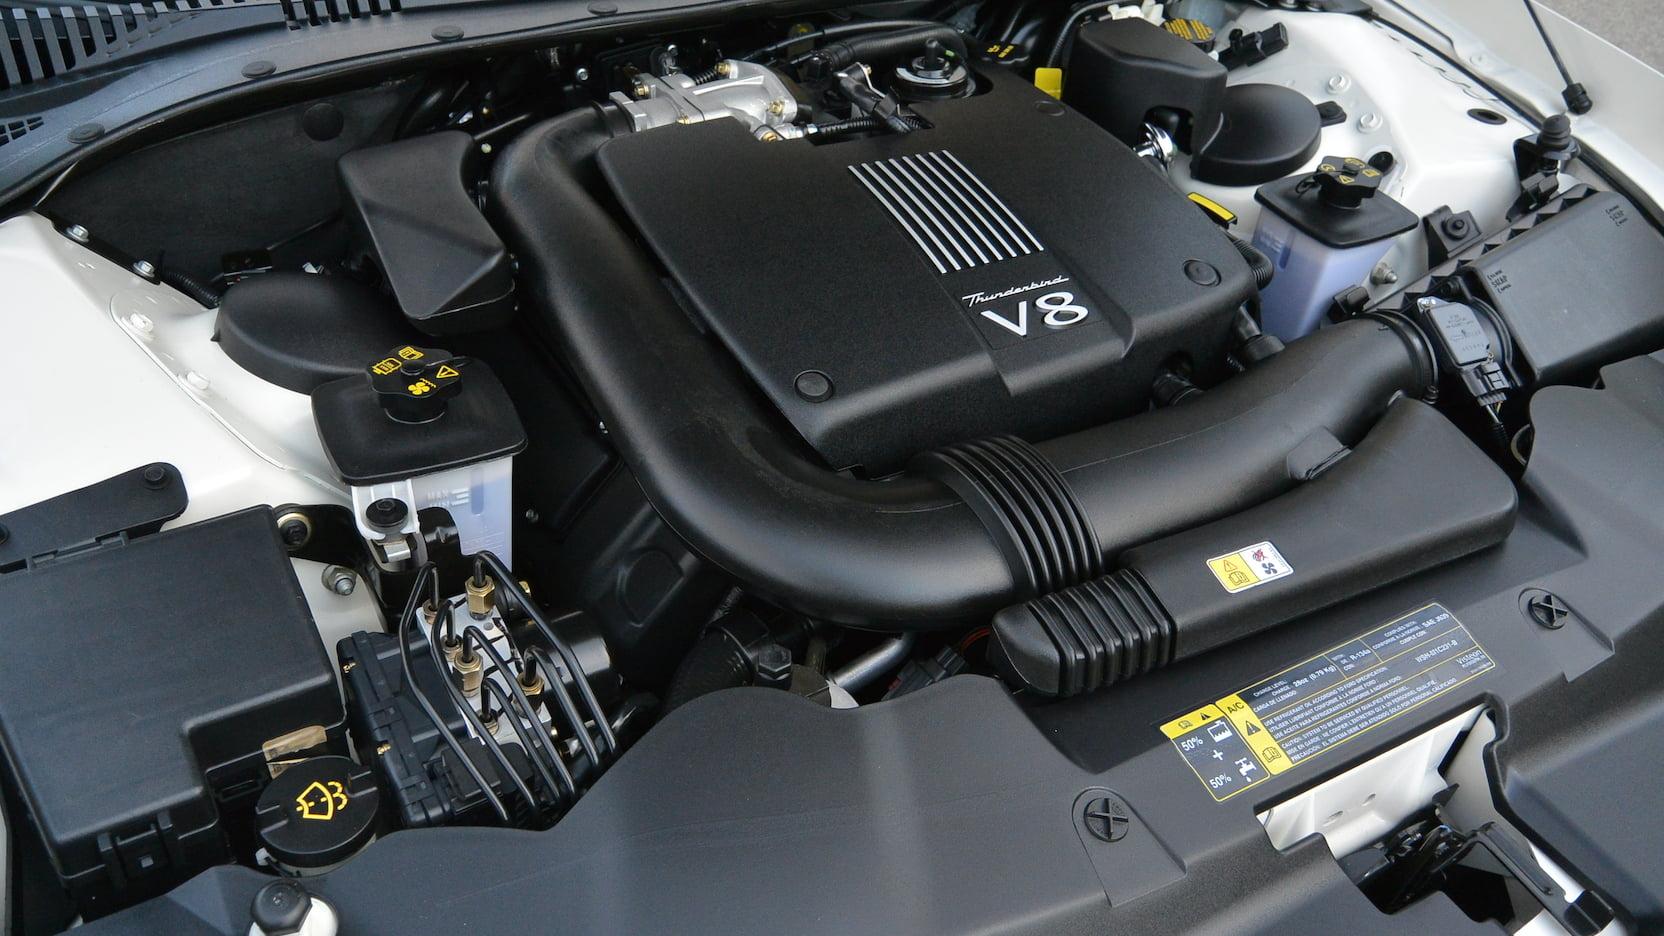 2002 Ford Thunderbird engine